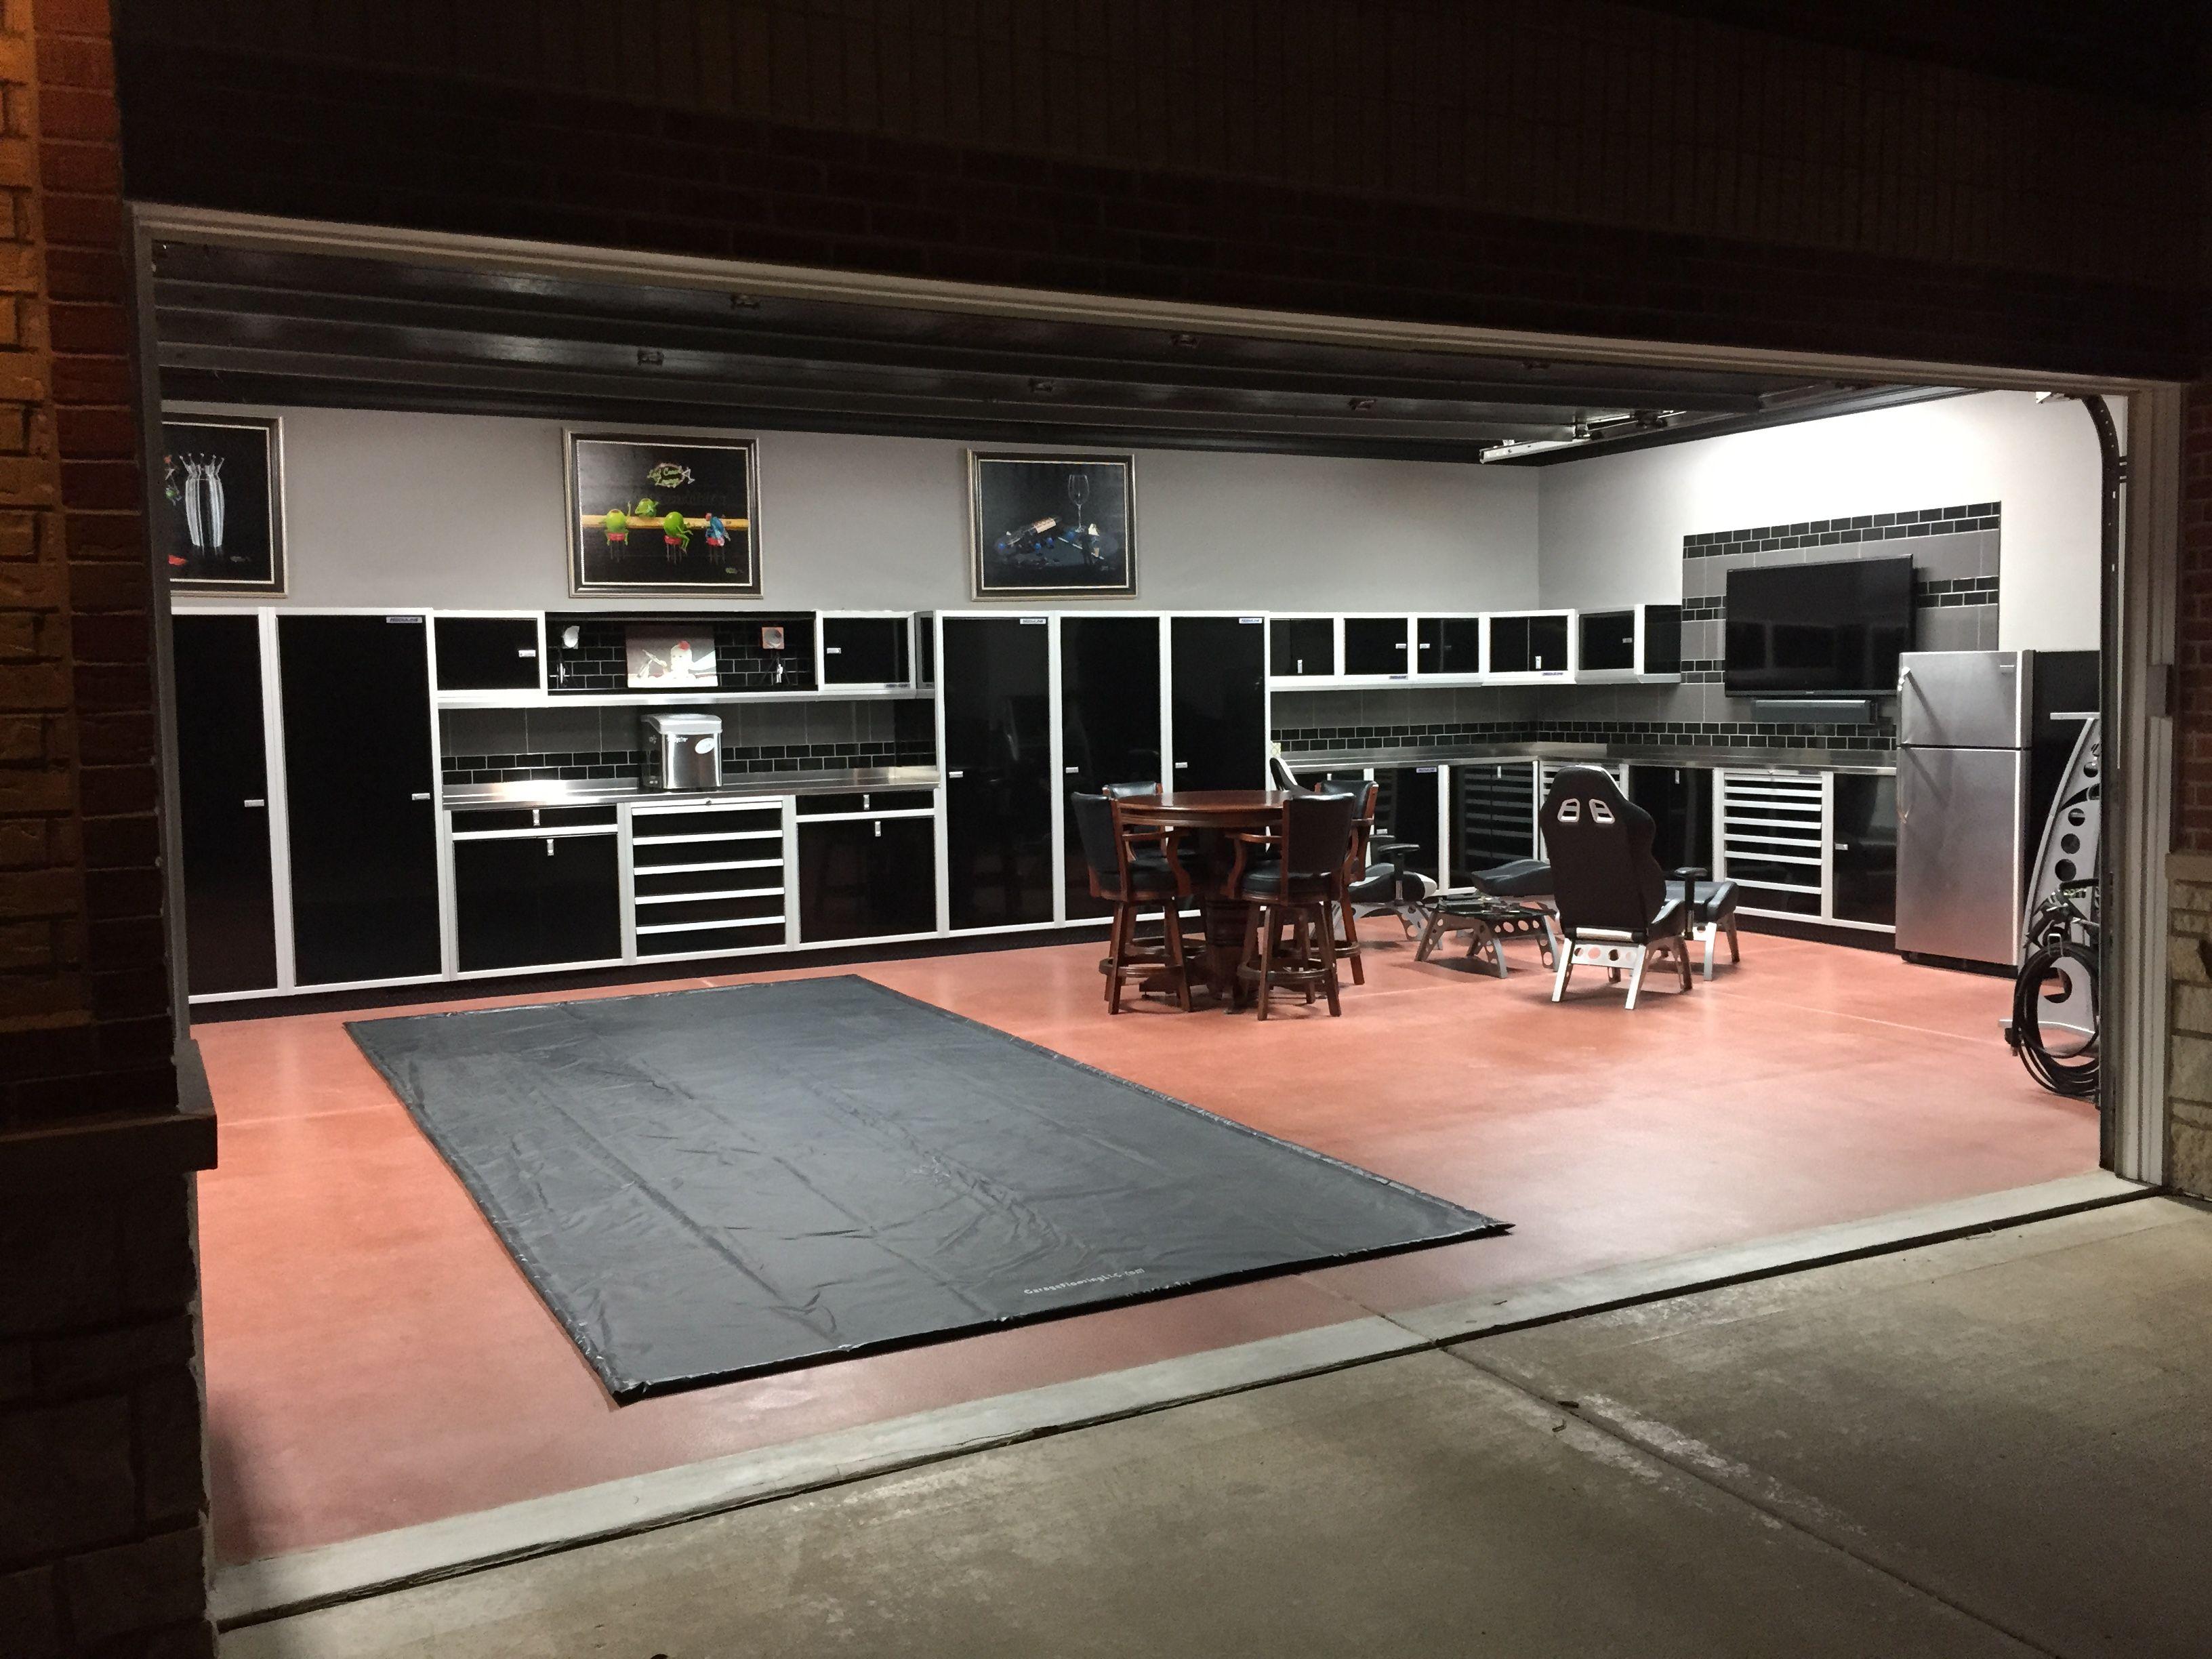 This garage is sweet garage ideas pinterest men for Affordable garage